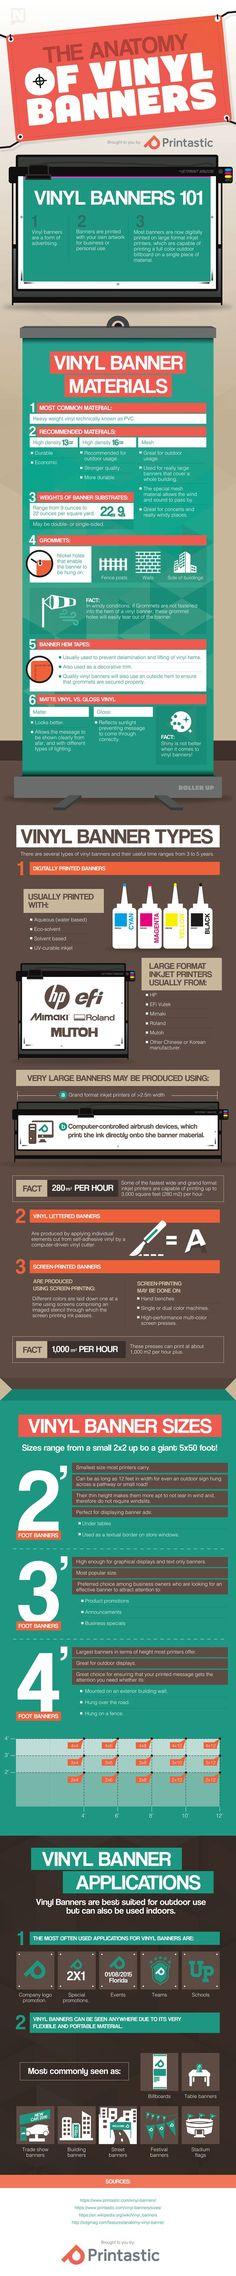 Best  Vinyl Banners Ideas On Pinterest Vinyl Banner Printing - Vinyl banners sizes